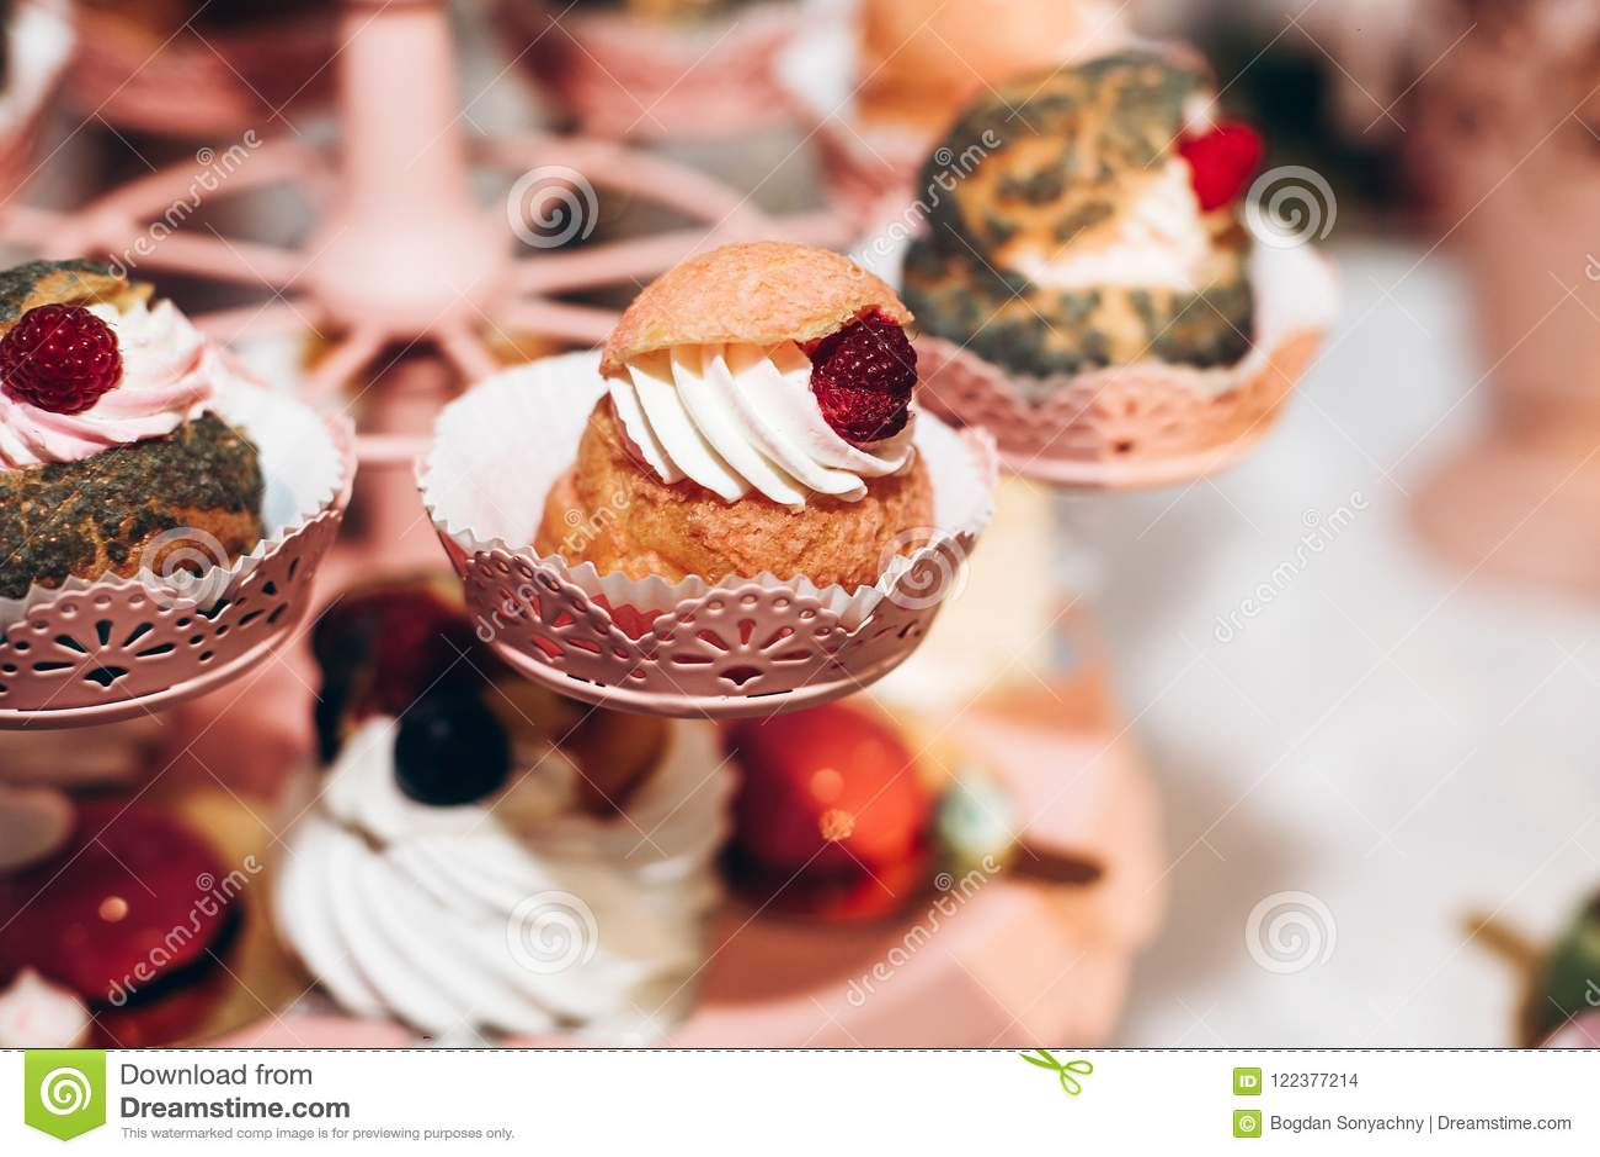 Delicious Cupcake Candy Bar At Luxury Wedding Reception Exclus